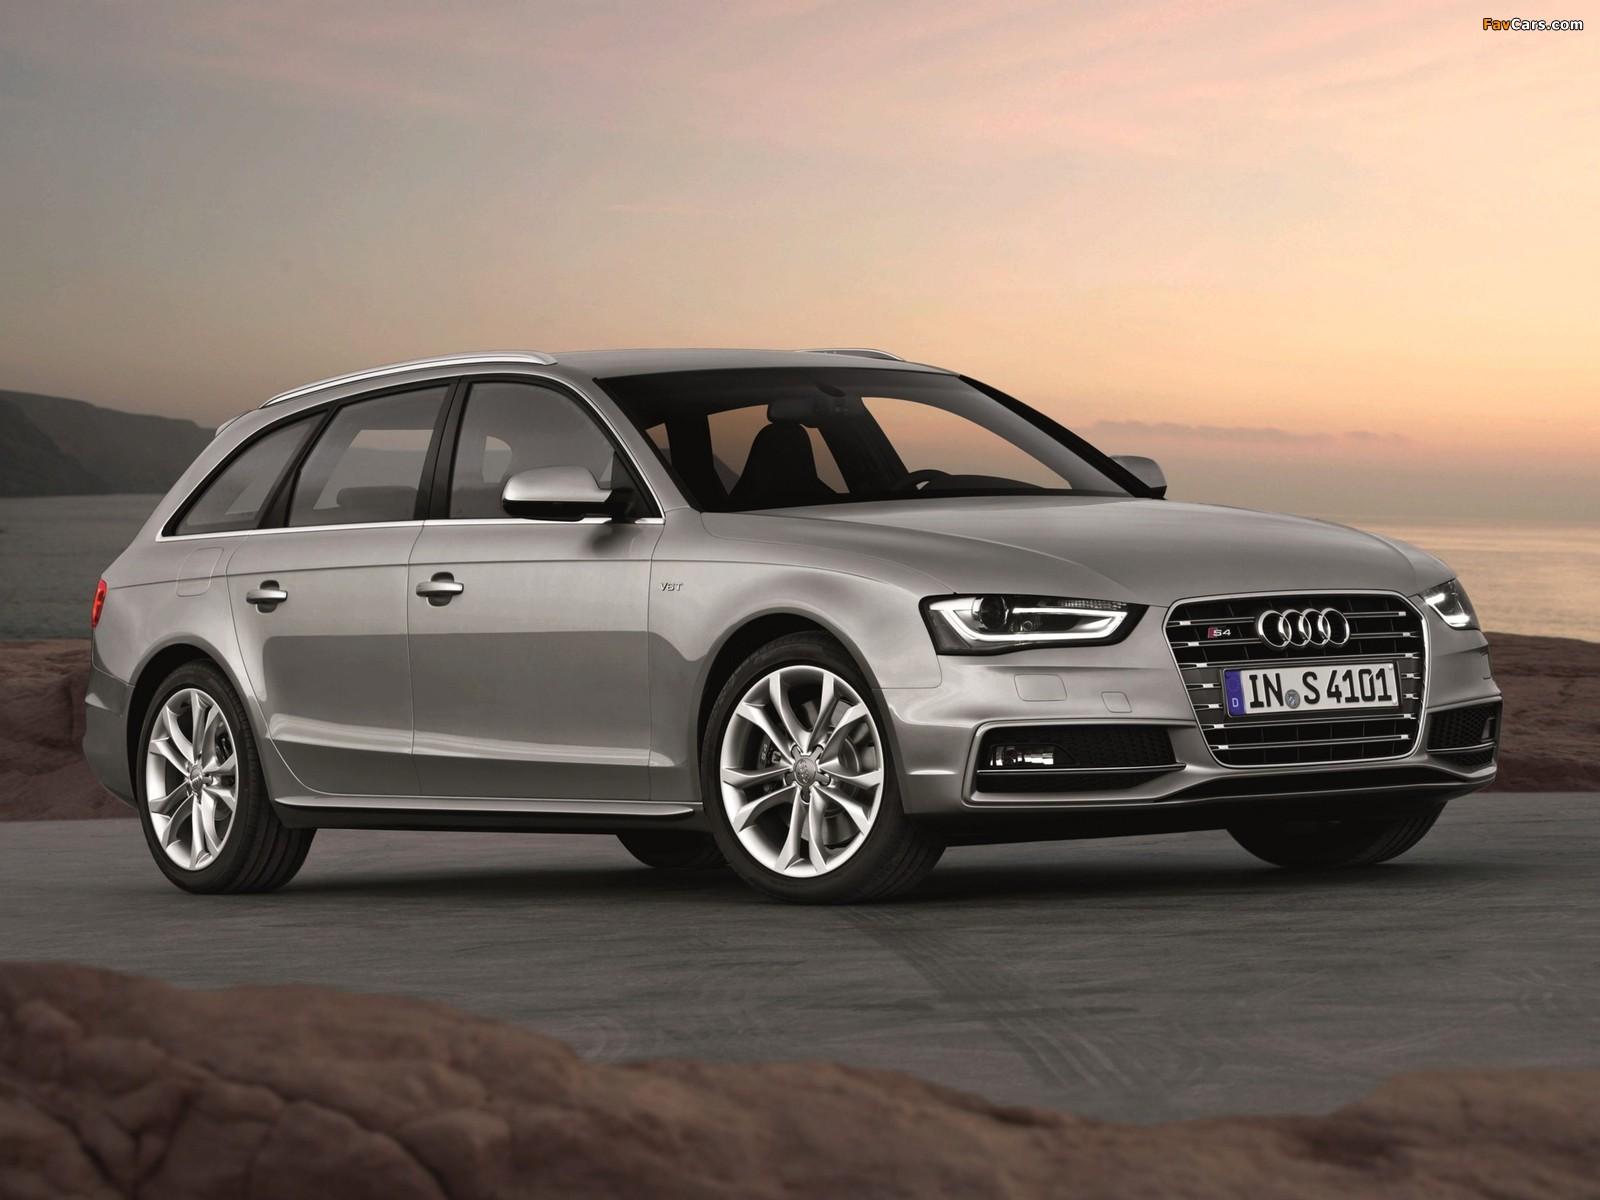 Audi S4 Avant B8 8k 2012 Wallpapers 1600x1200